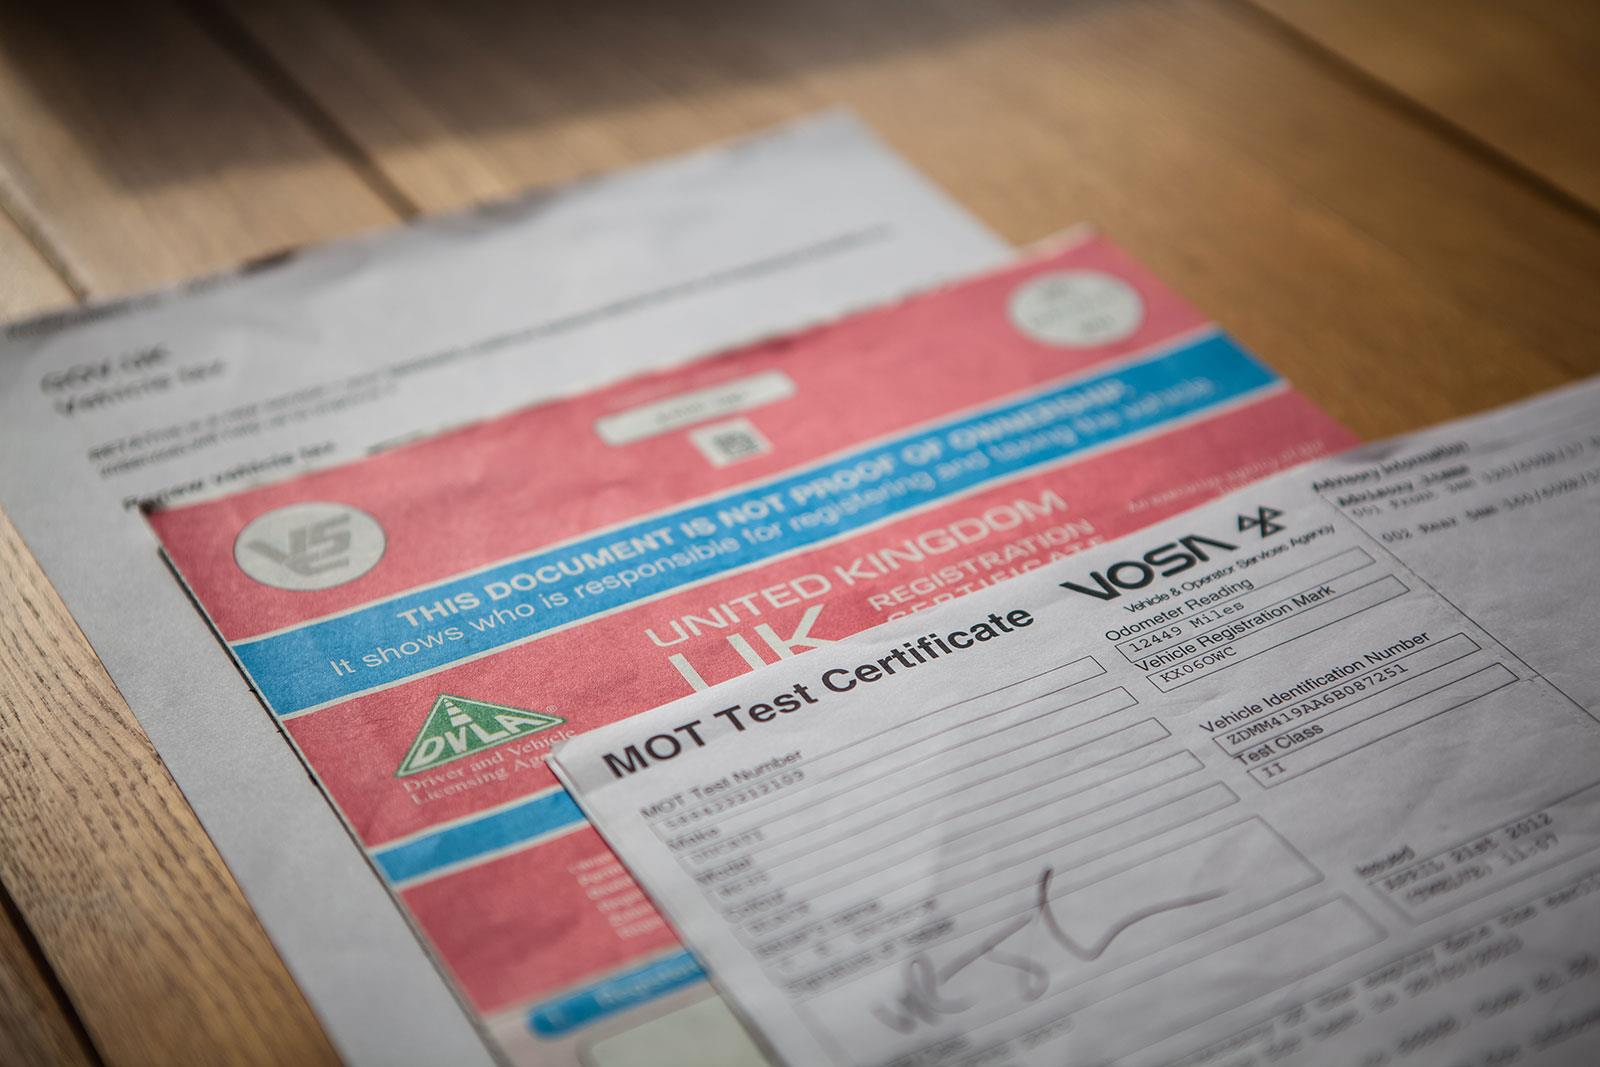 Check bike documents carefully